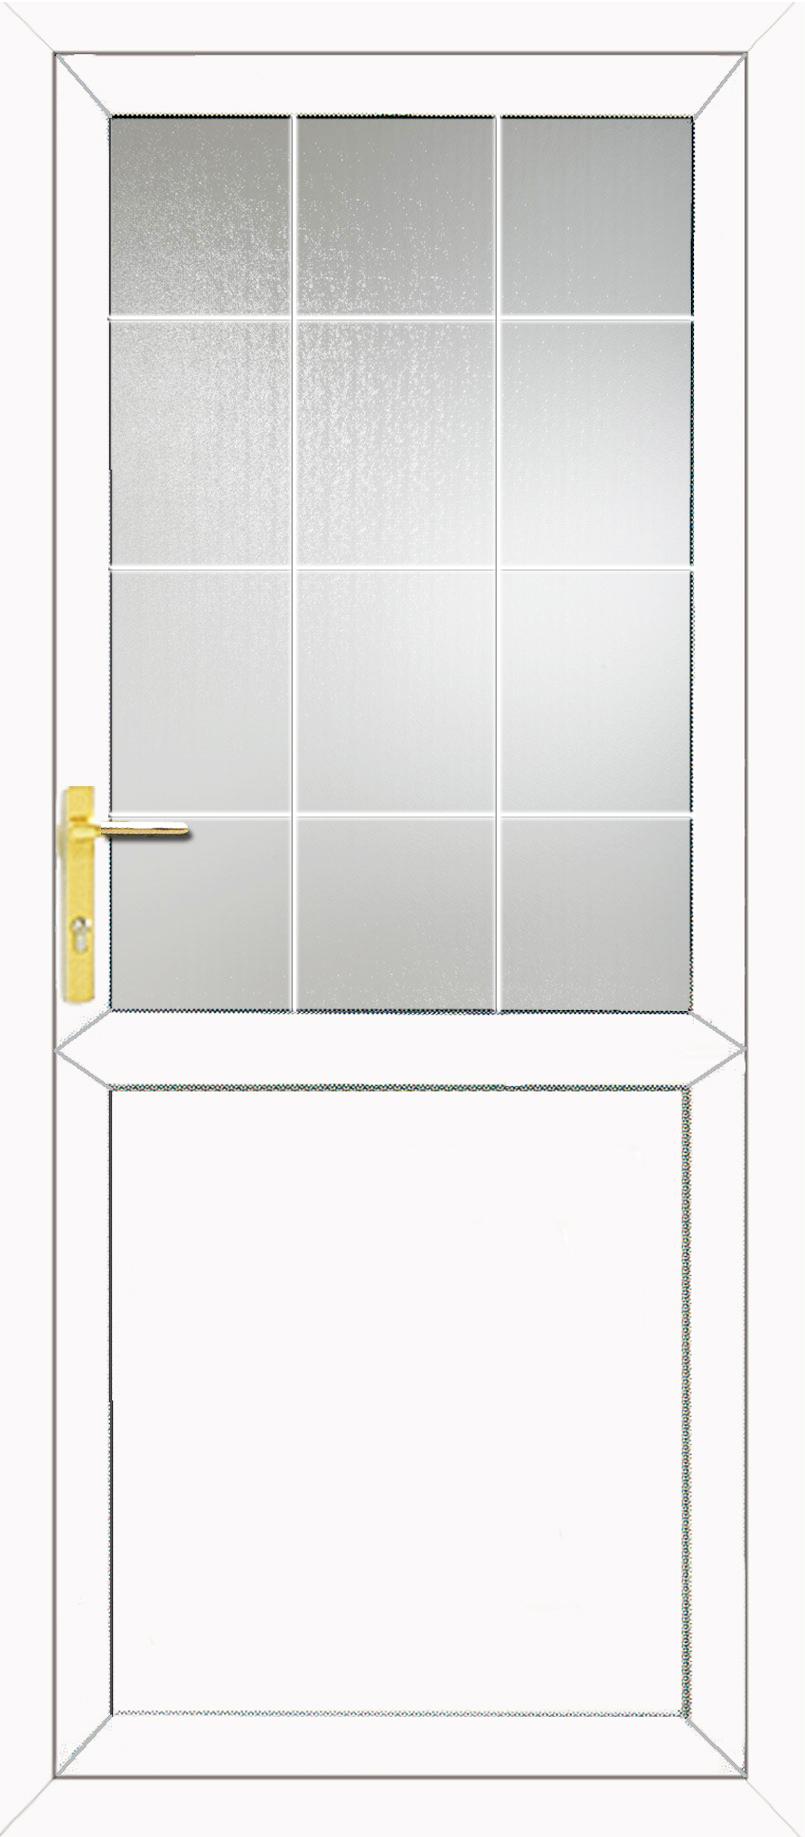 Half glazed flat panel 2xg style georgian bar upvc back door for Upvc french doors with georgian bar